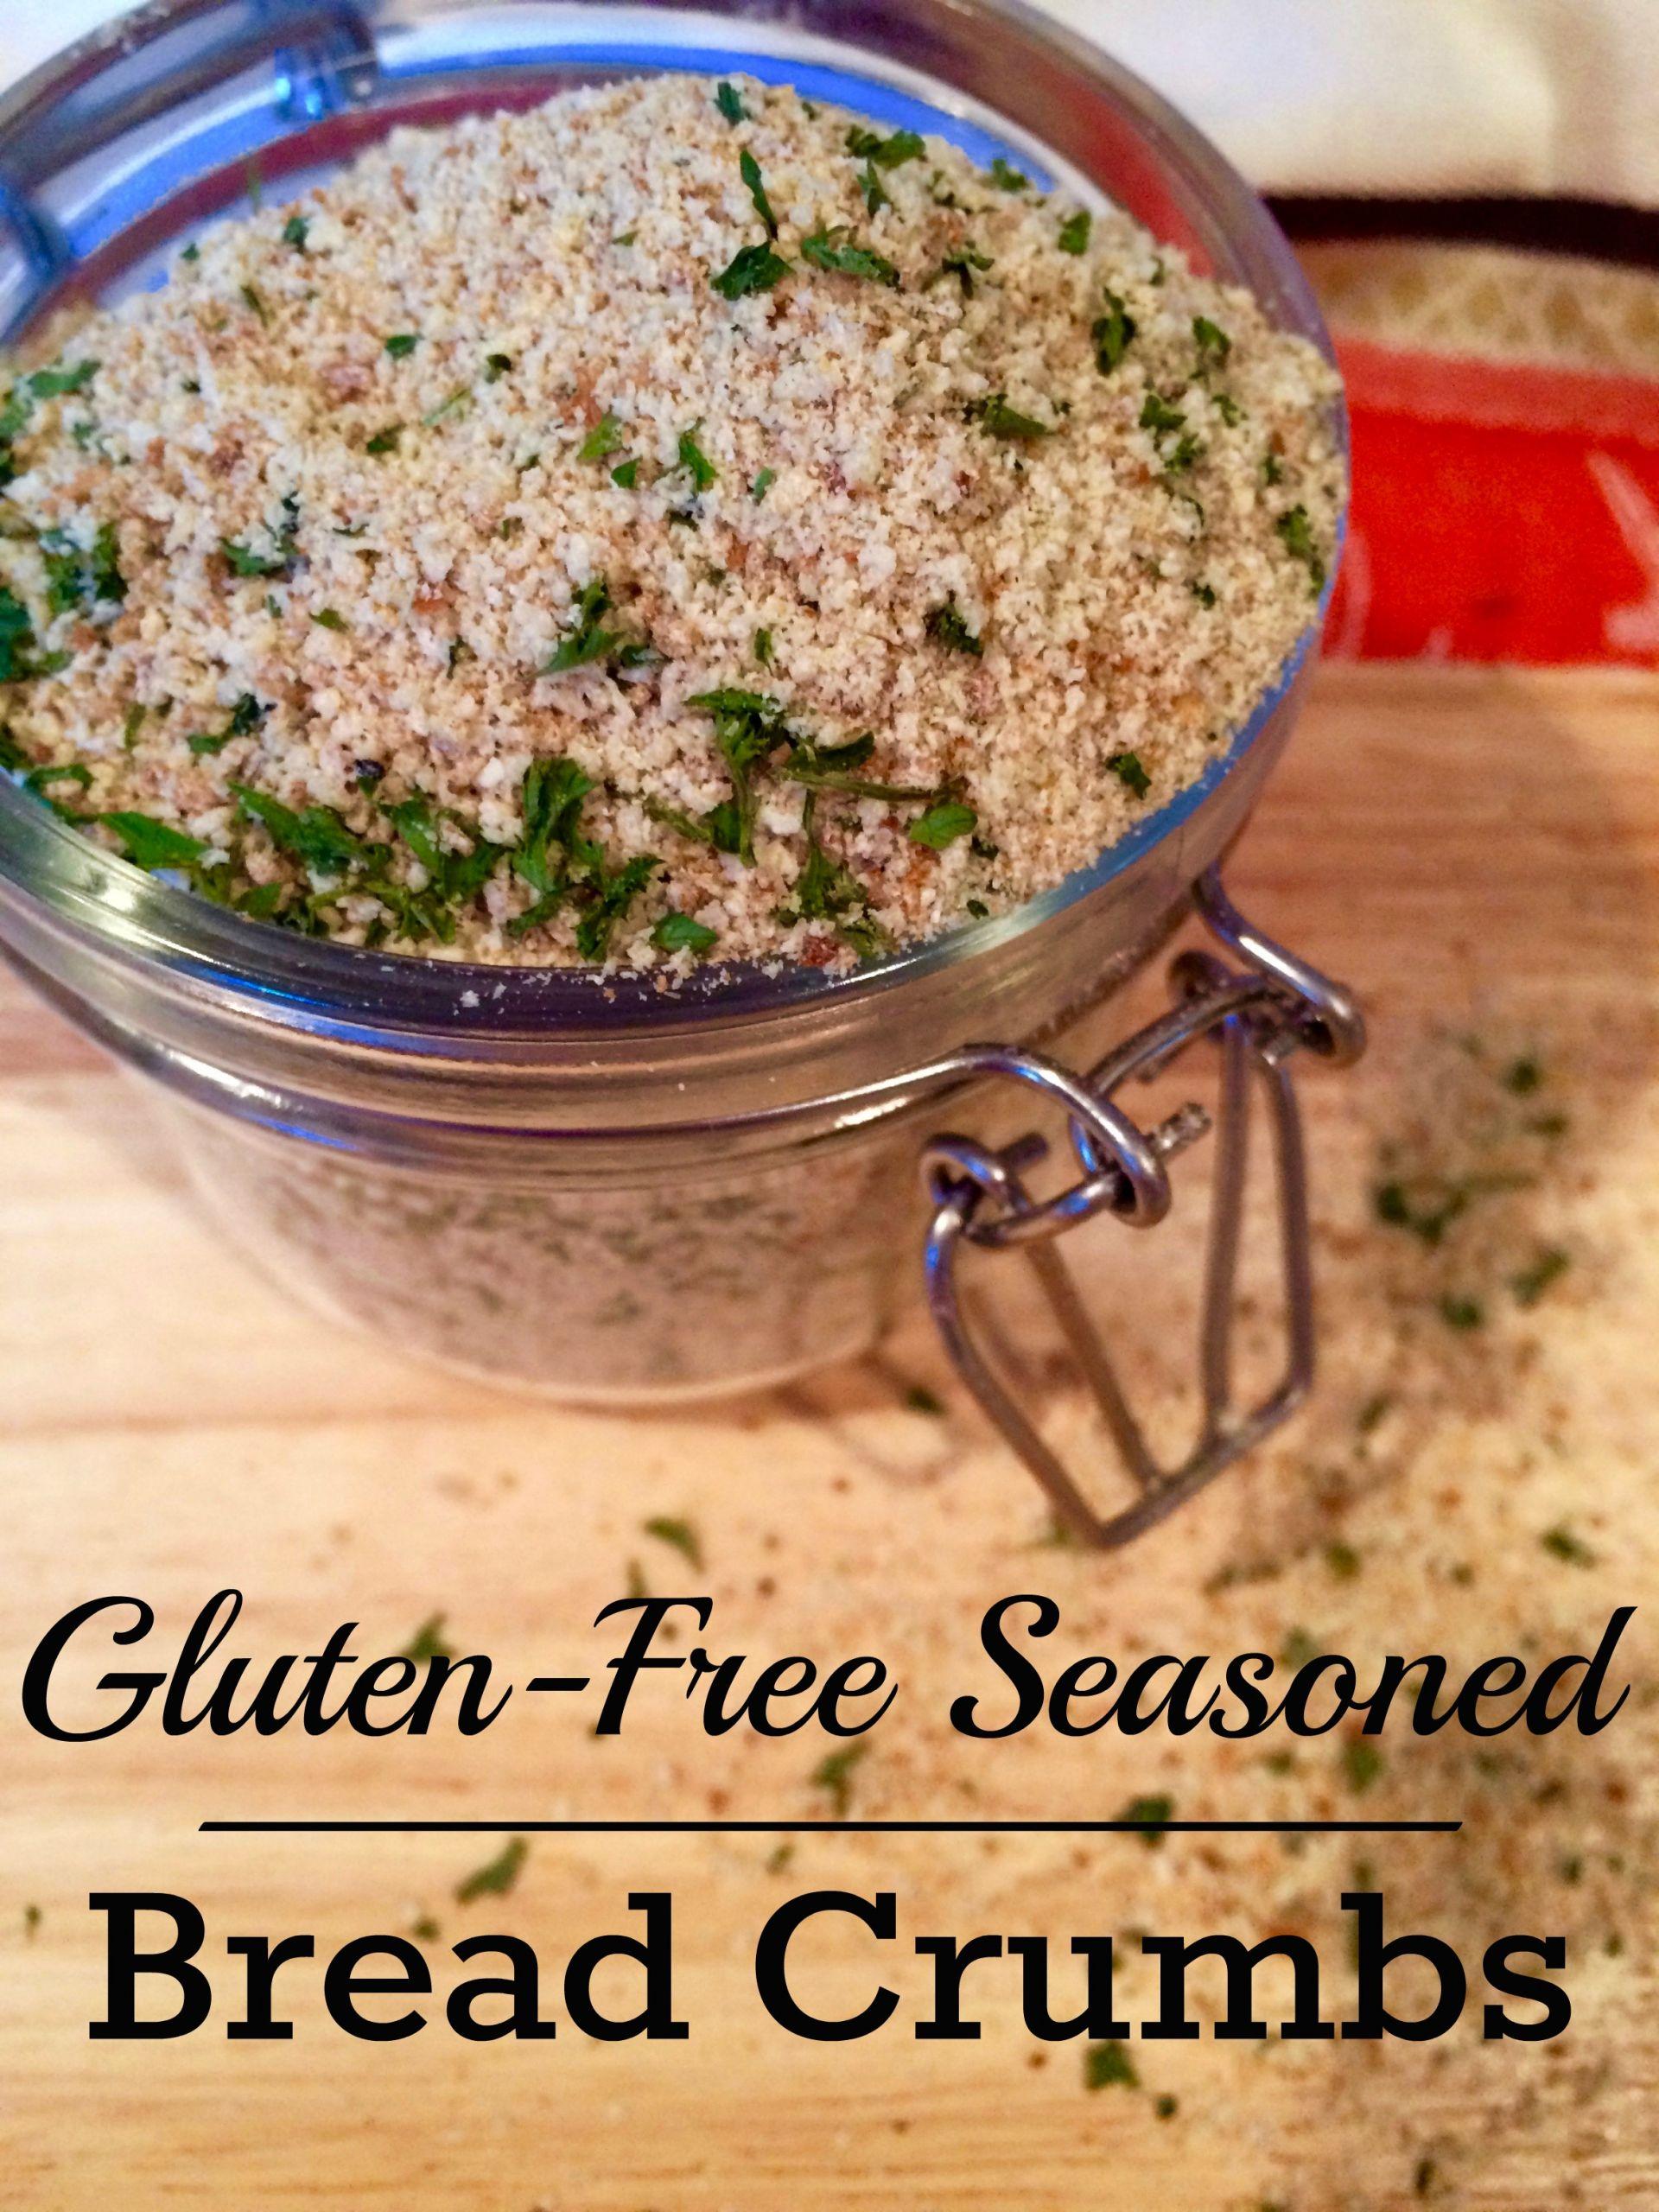 Gluten Free Bread Crumbs Recipe  Gluten Free Seasoned Bread Crumbs Simple Sojourns